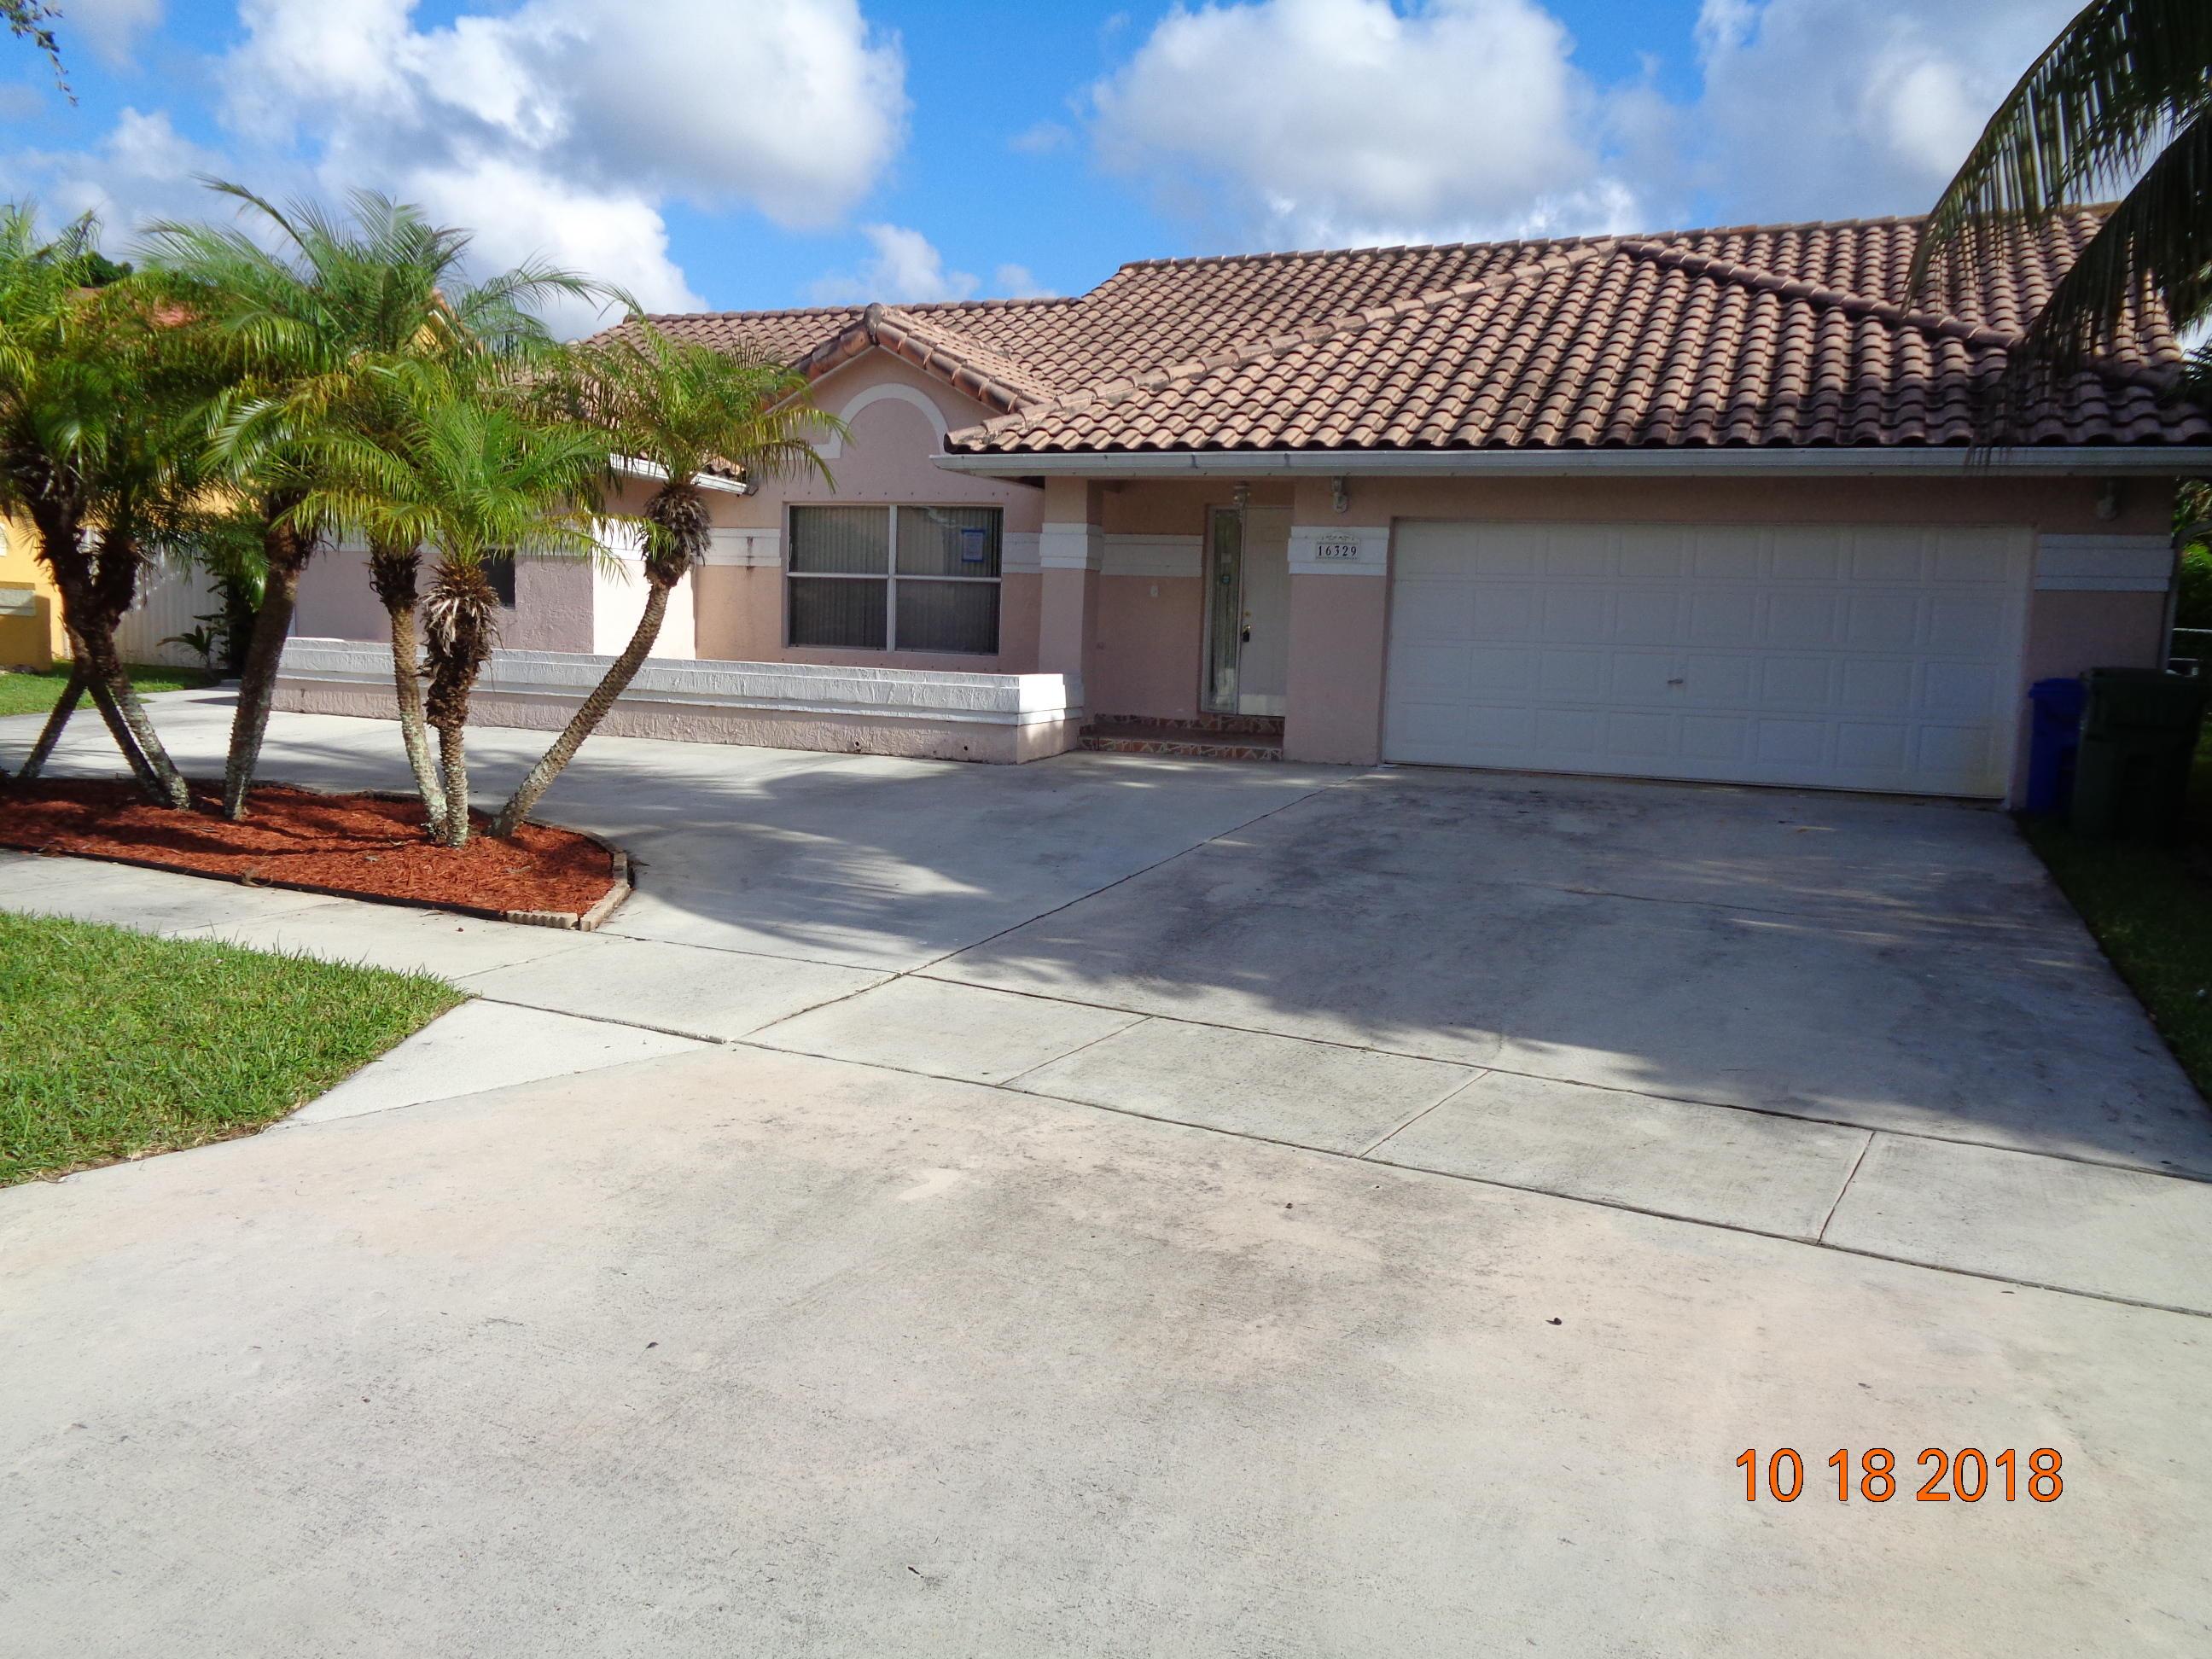 16329 Nw 16th Street, Pembroke Pines, FL 33028